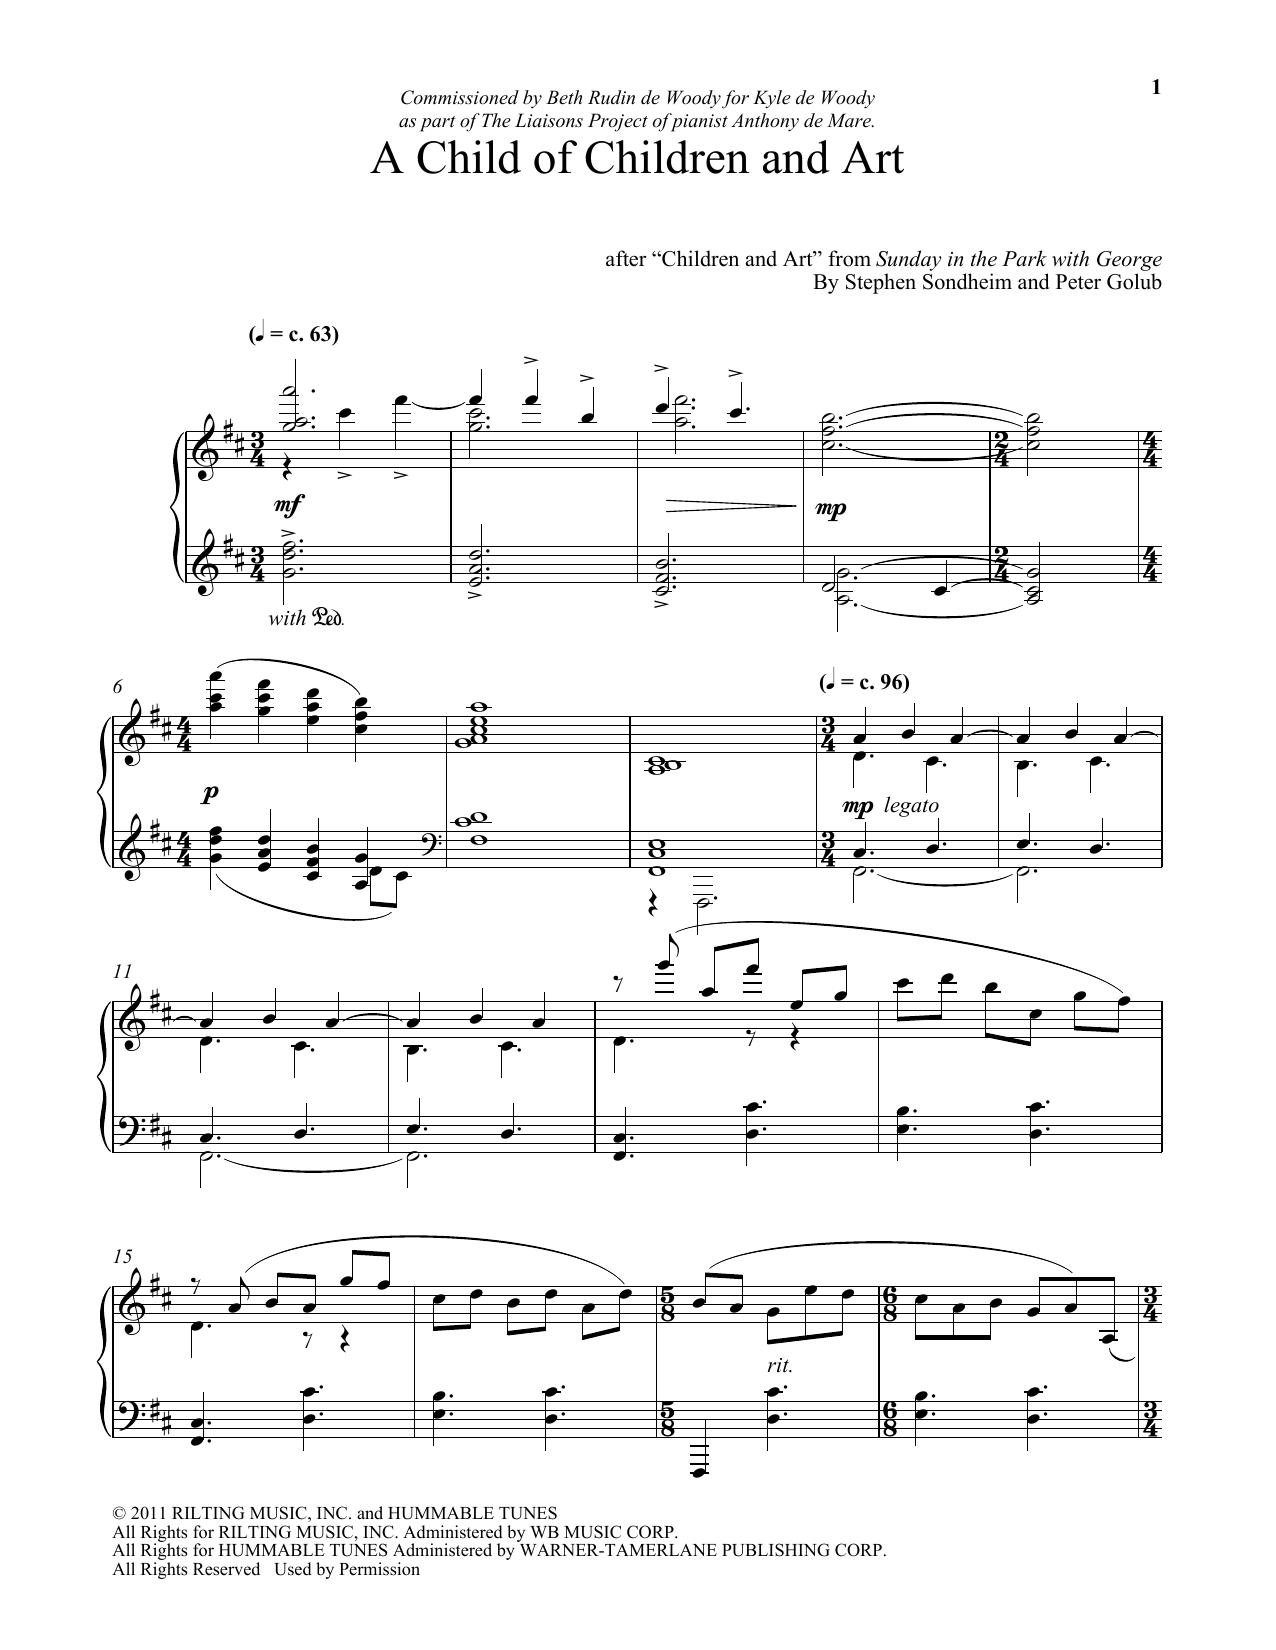 Stephen Sondheim A Child Of Children And Art (arr. Peter Golub) sheet music notes and chords